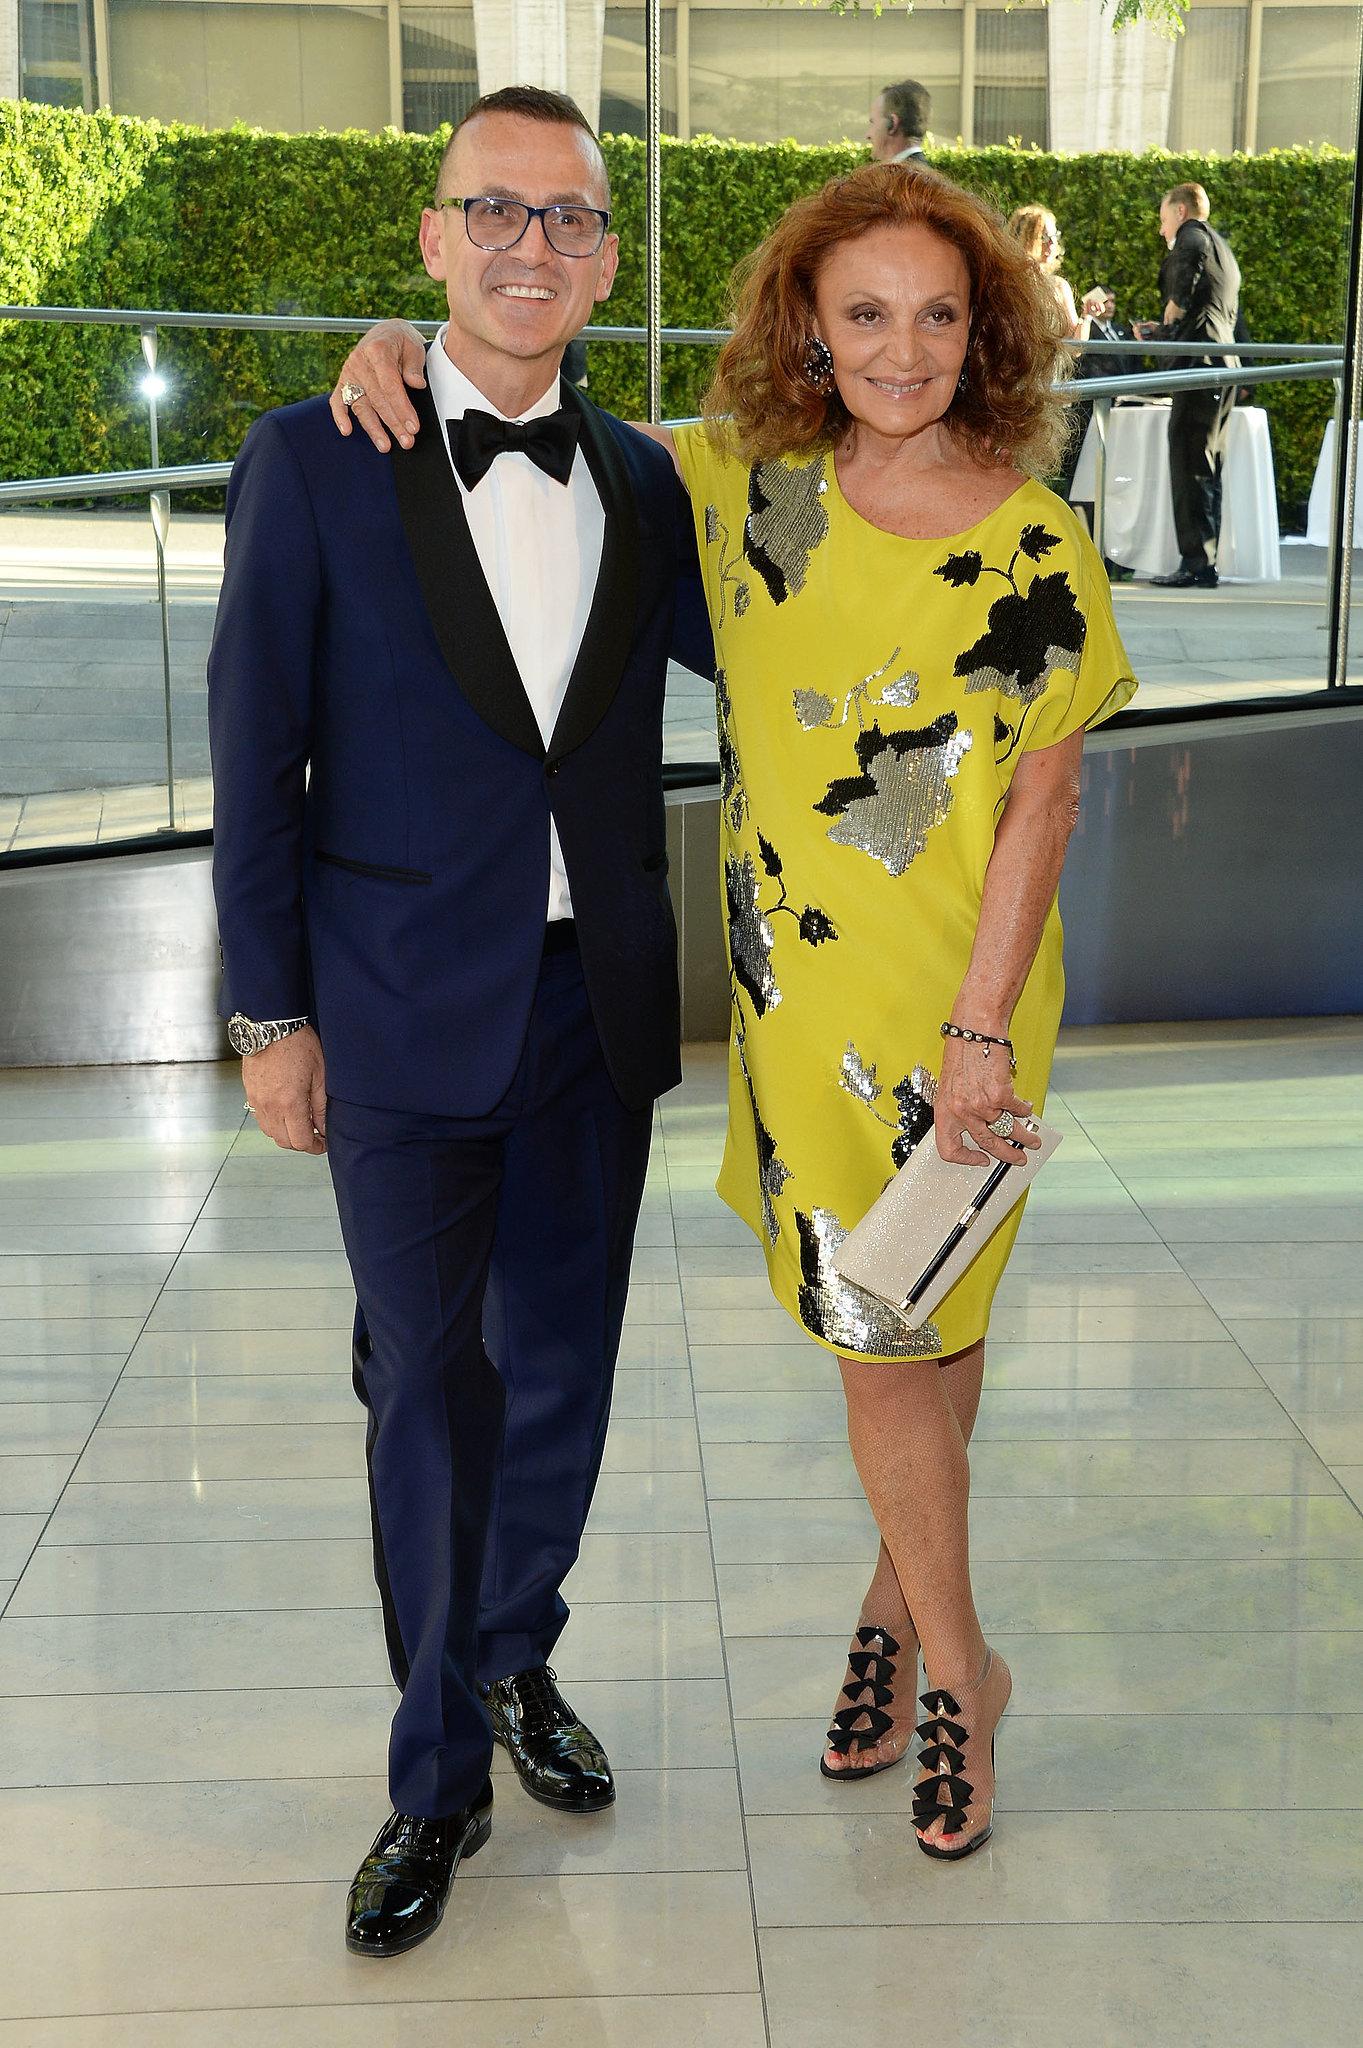 Diane von Furstenberg arrived with Steven Kolb.